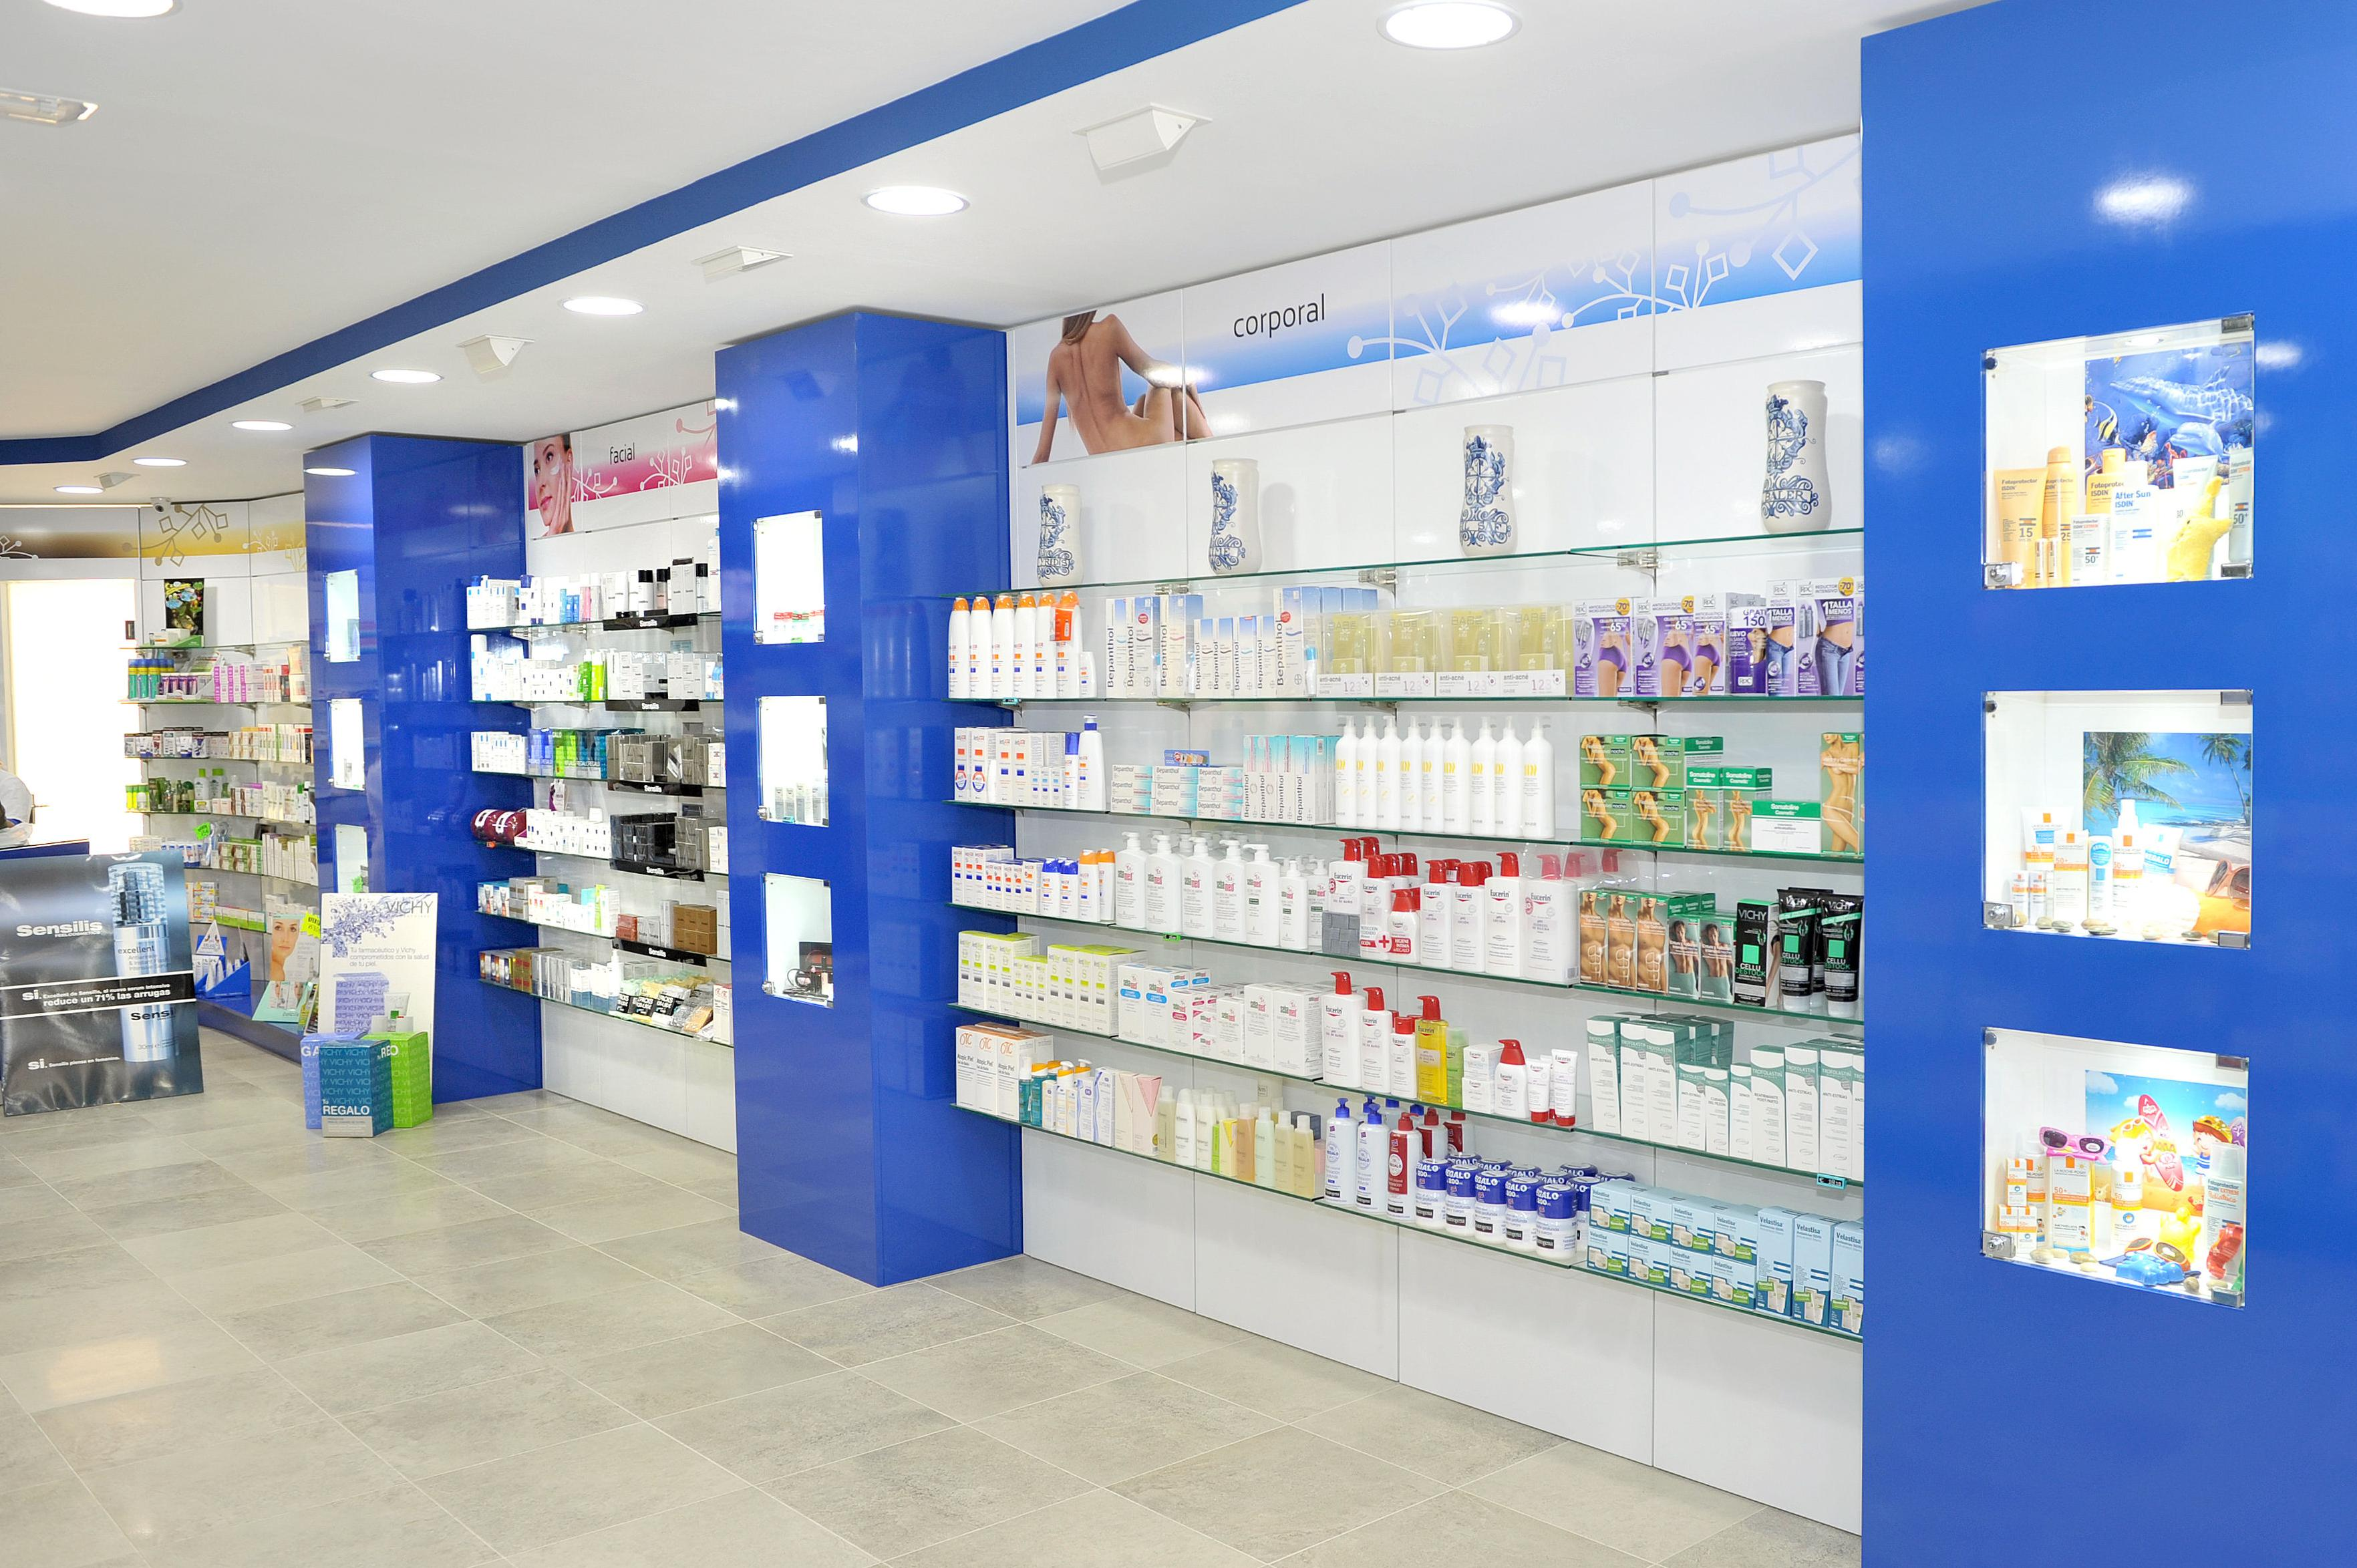 Reforma de farmacias en Tenerife